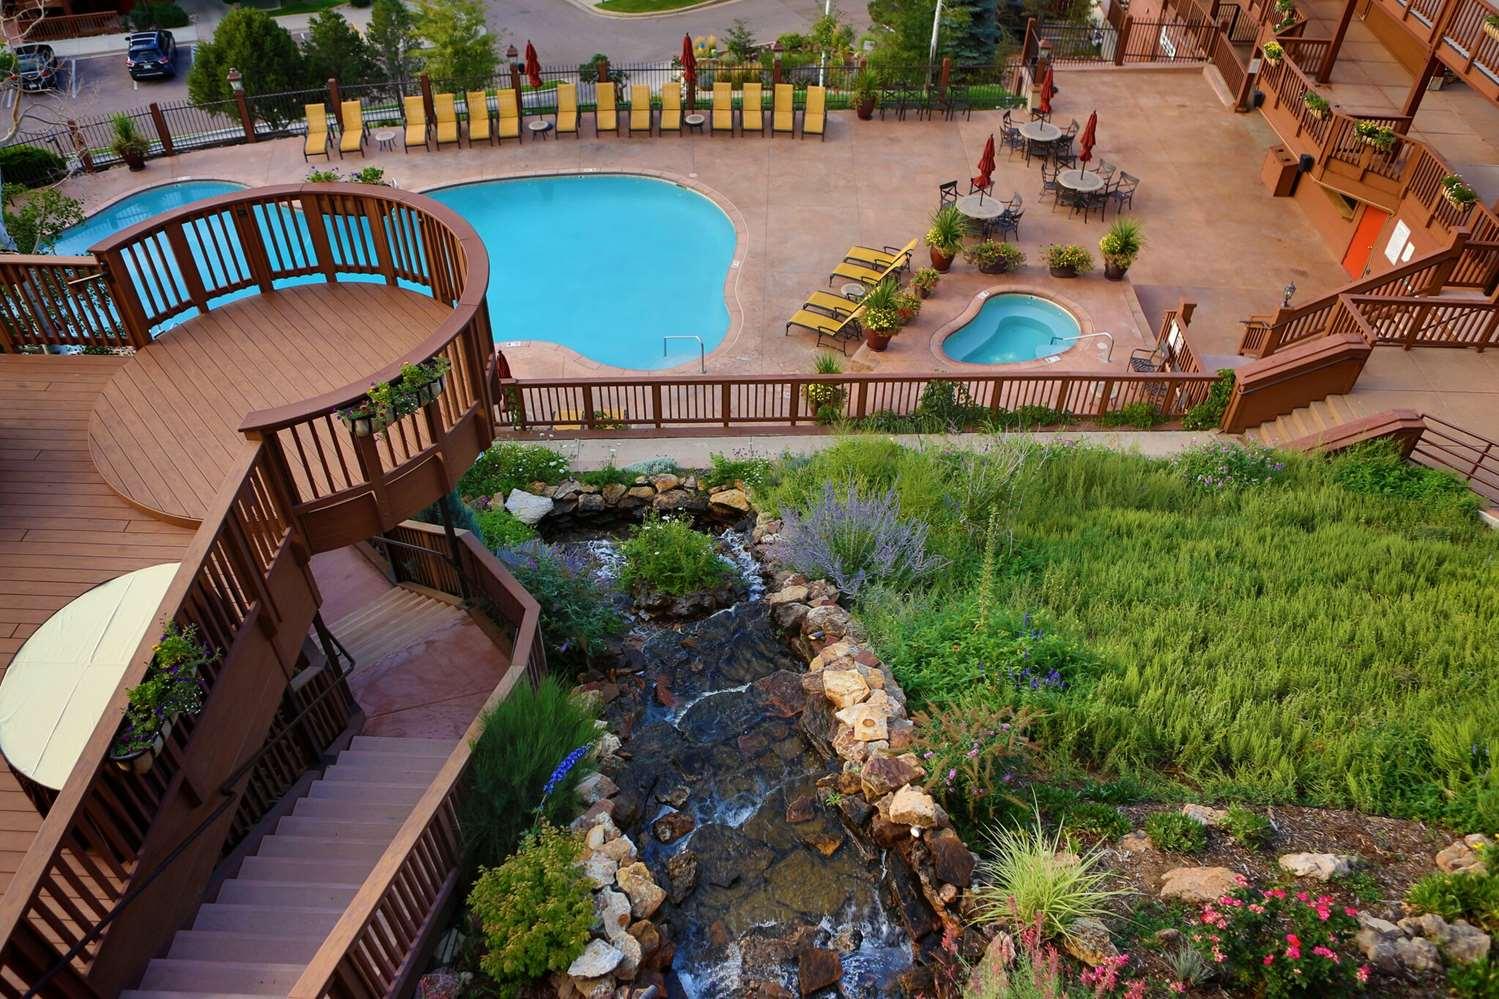 Pool - Cheyenne Mountain Resort Colorado Springs